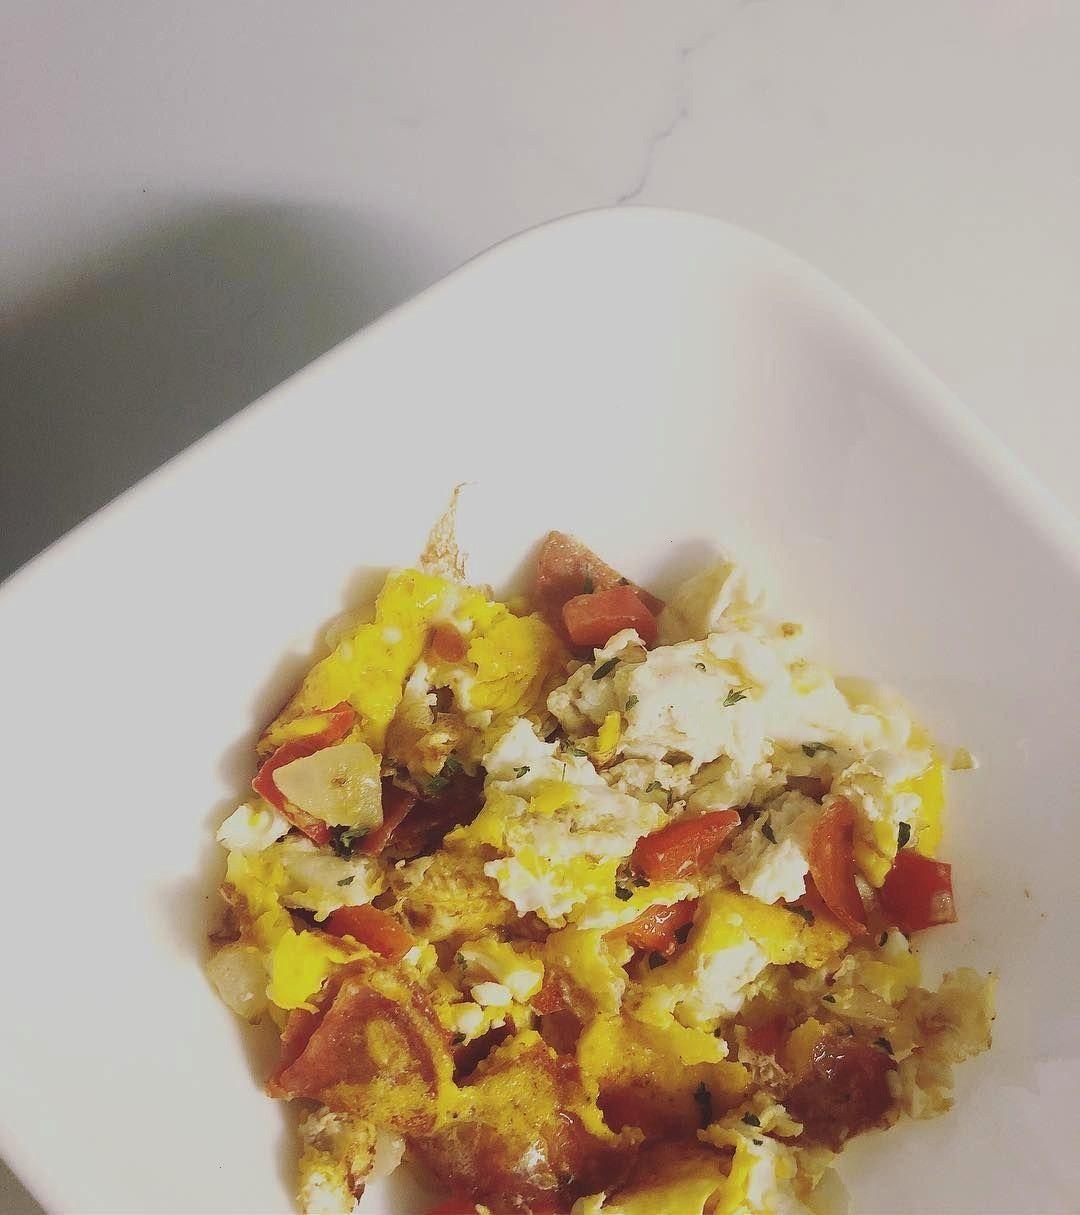 #lunchrecipesweekend #fitgirlsguide #positivevibes #healthyliving #goodmorning #amazoncom #pepperoni...